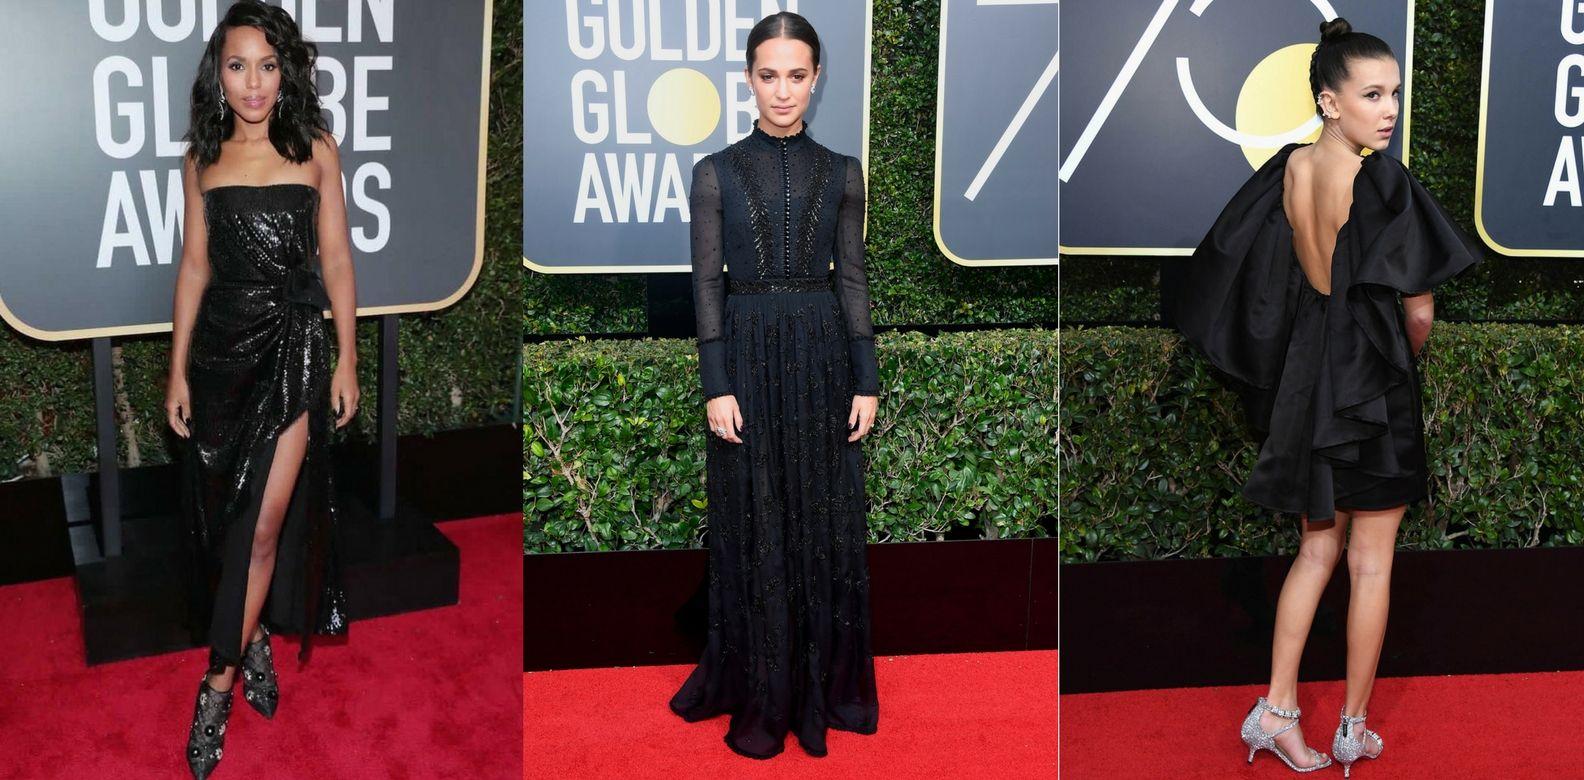 15 Best Statement Black Dresses At The Golden Globes 2018